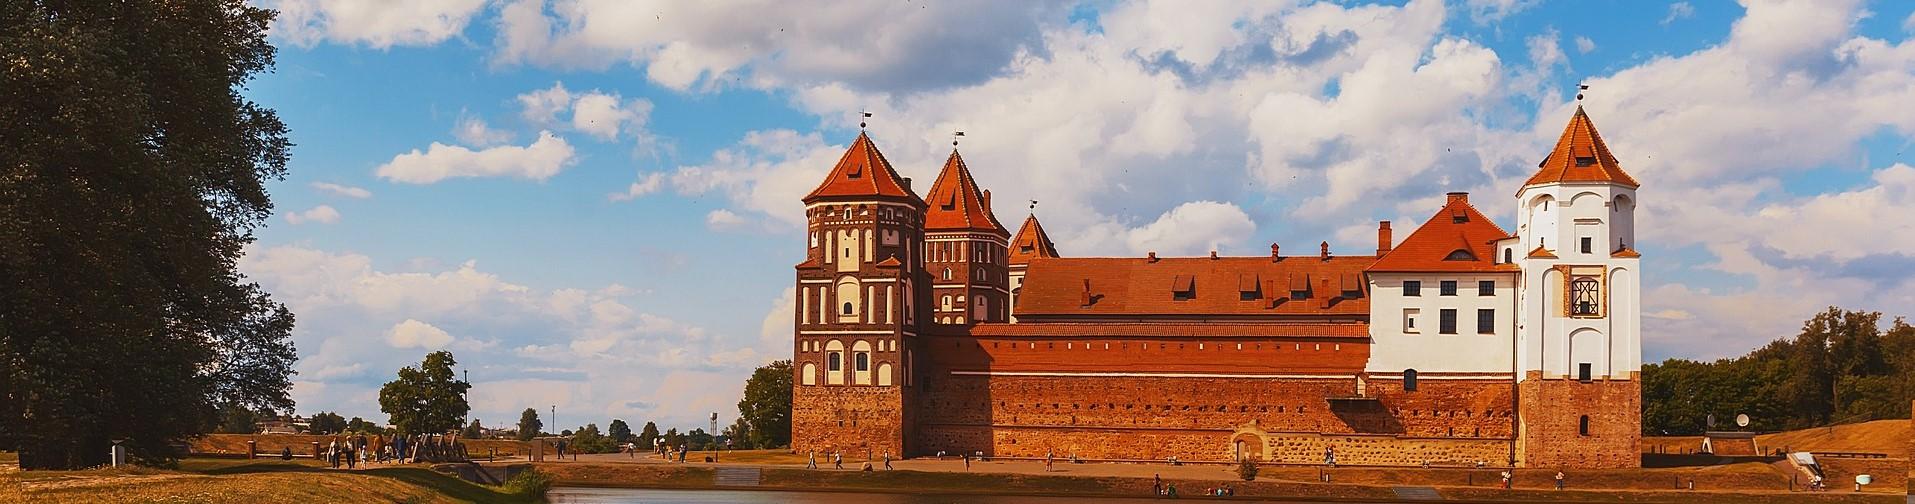 Best of Belarus, Ukraine, Moldova Tour 2020